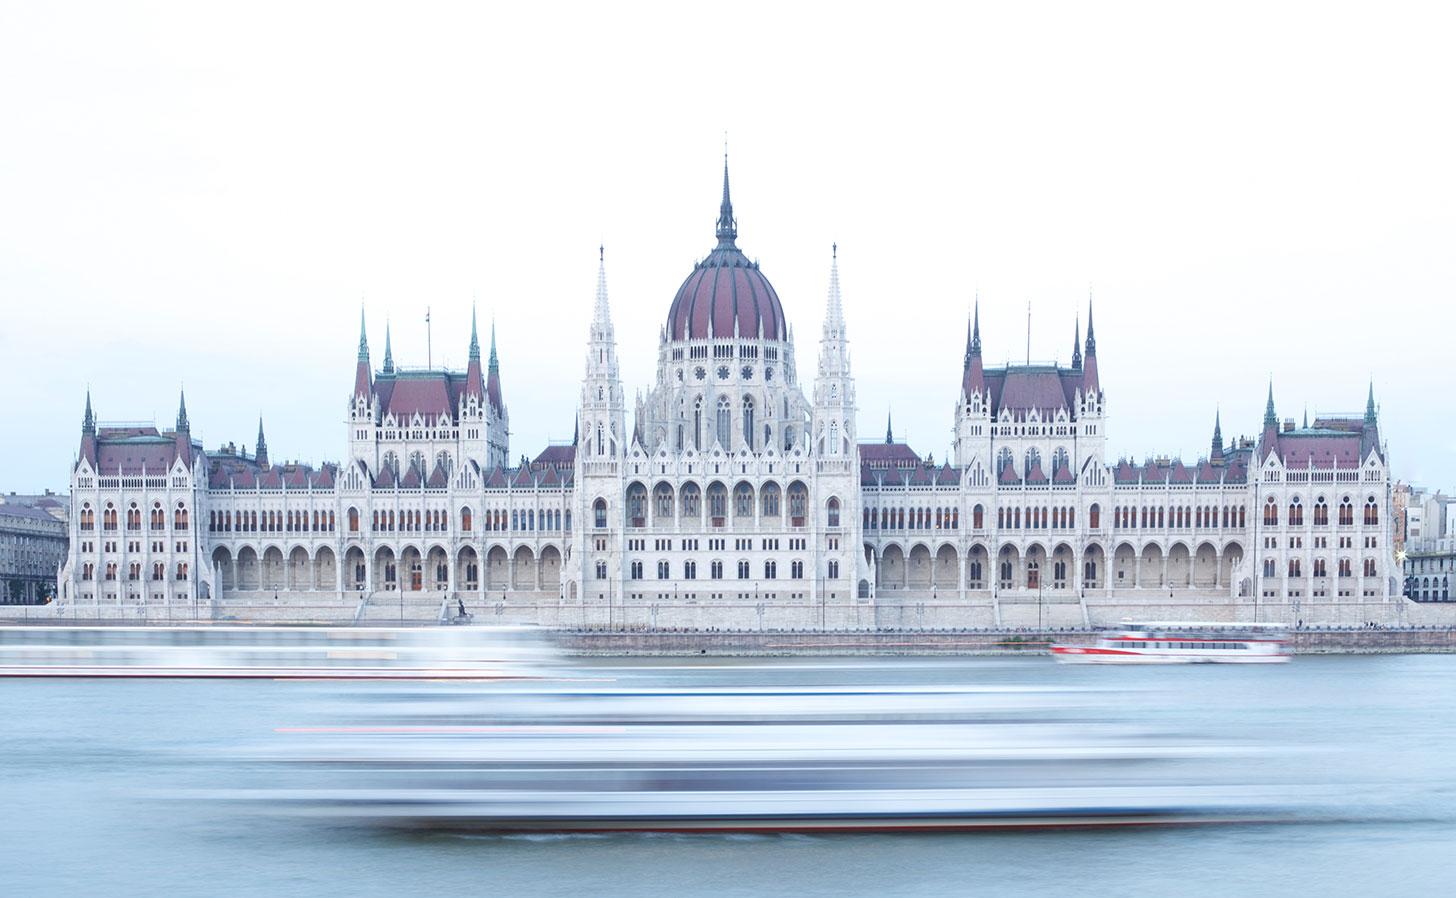 Ungerska parlamentsbyggnaden i Budapest. Foto: Karim MANJRA / Unsplash